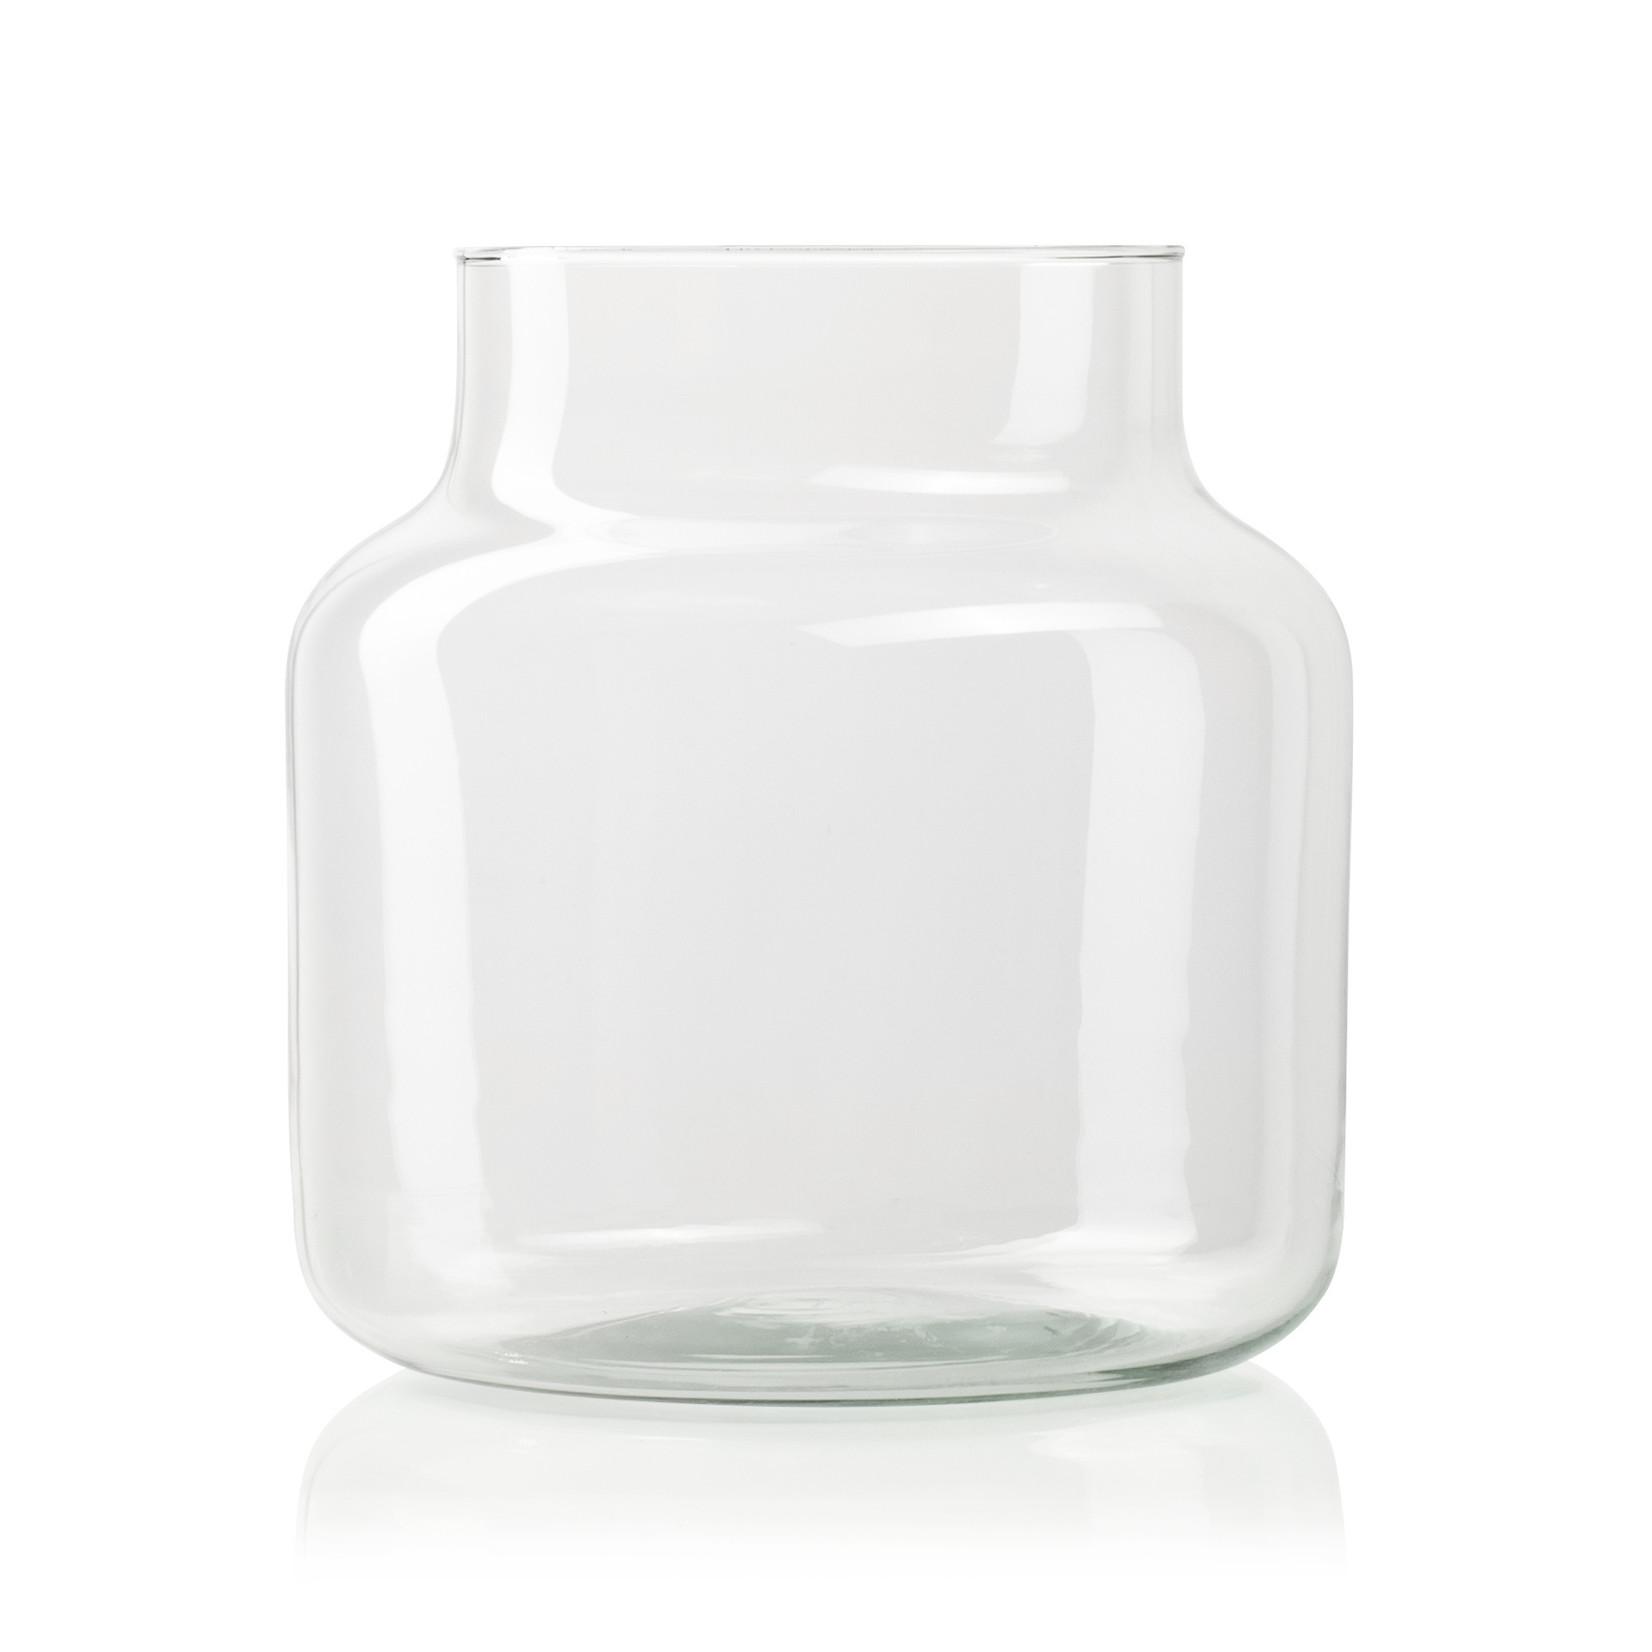 Jodeco Glass Eco vaas 'Eliot'